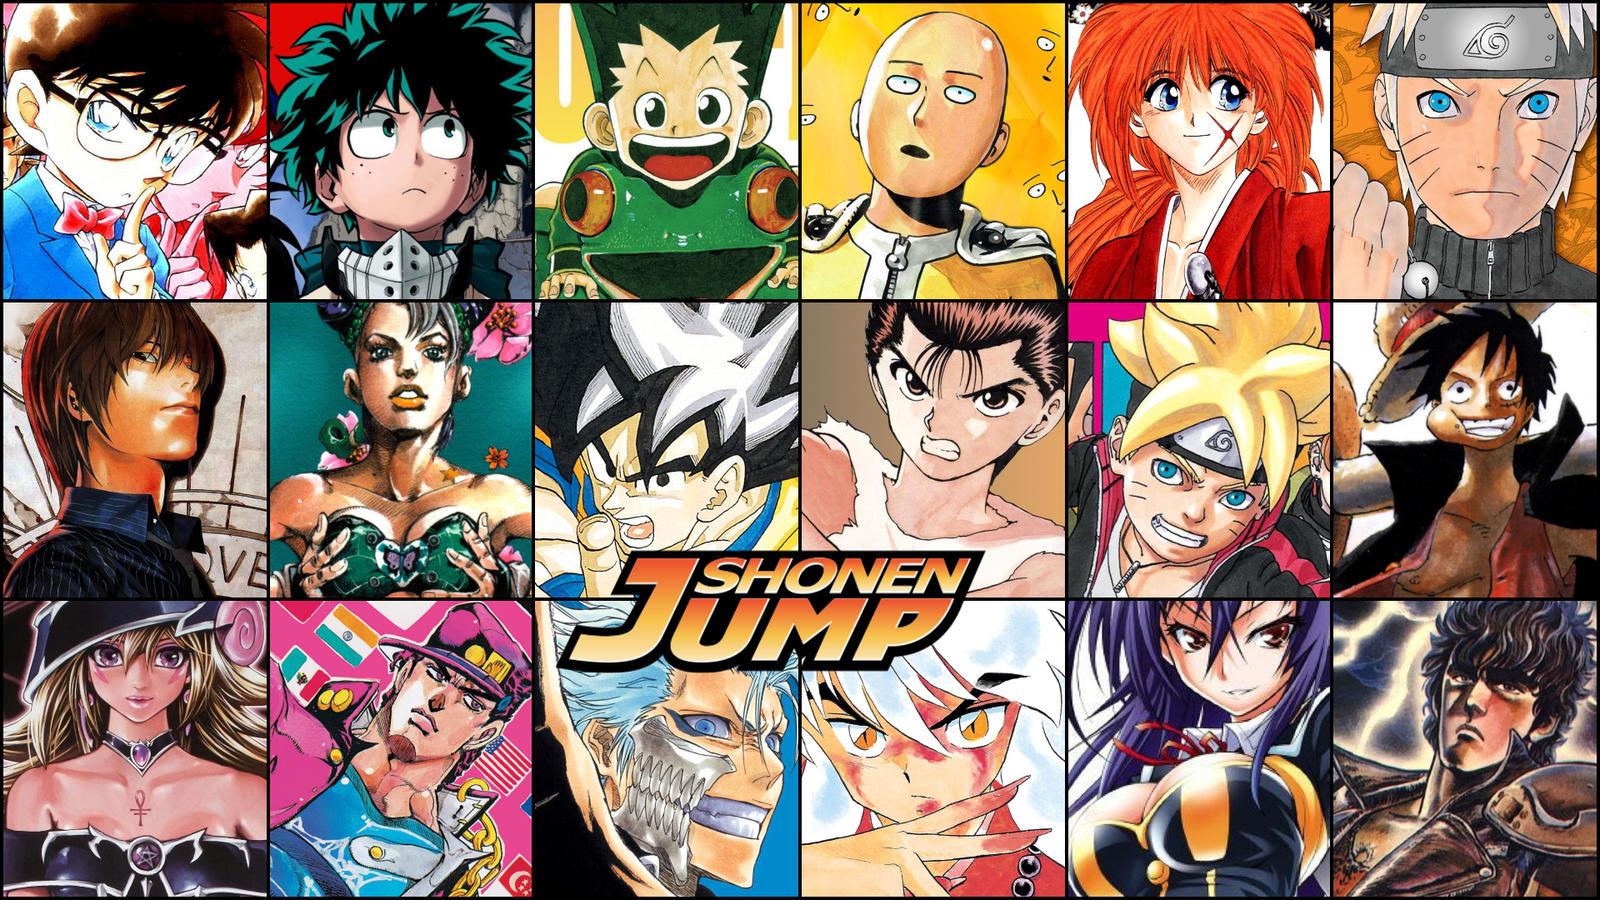 Manga And Manga Illustrations Wallpaper On Wallpaperarcade Deviantart